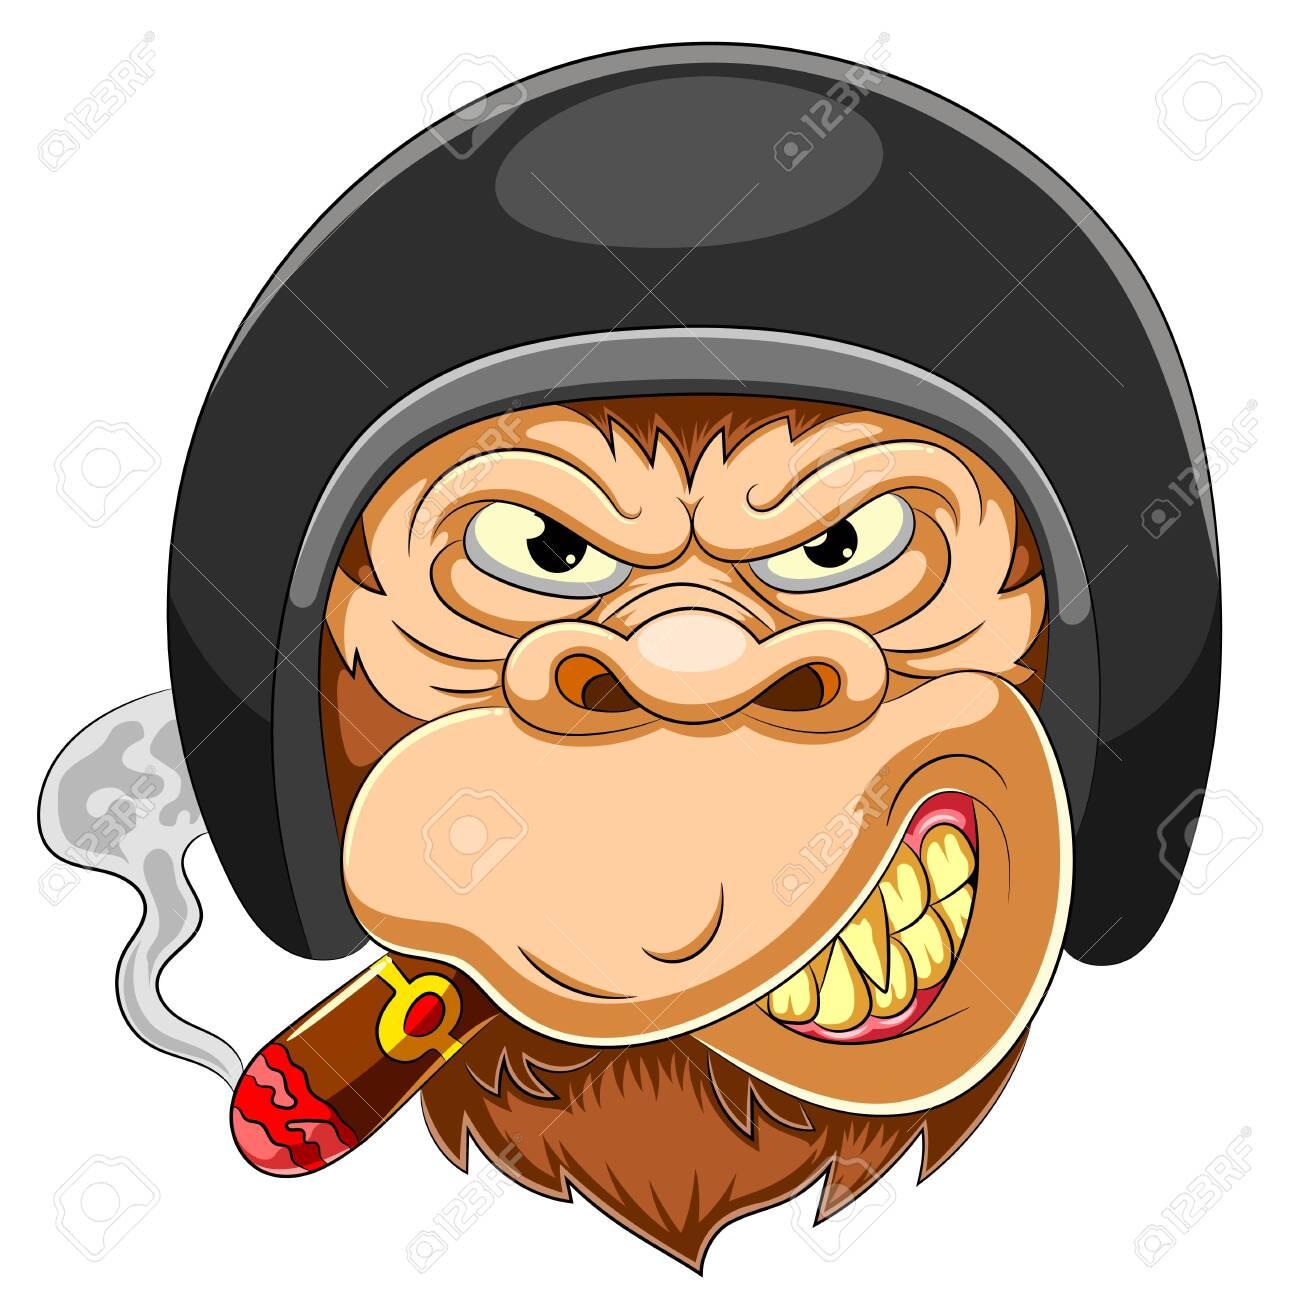 Scary Monkey wearing helmet of Racer of illustration - 150168629